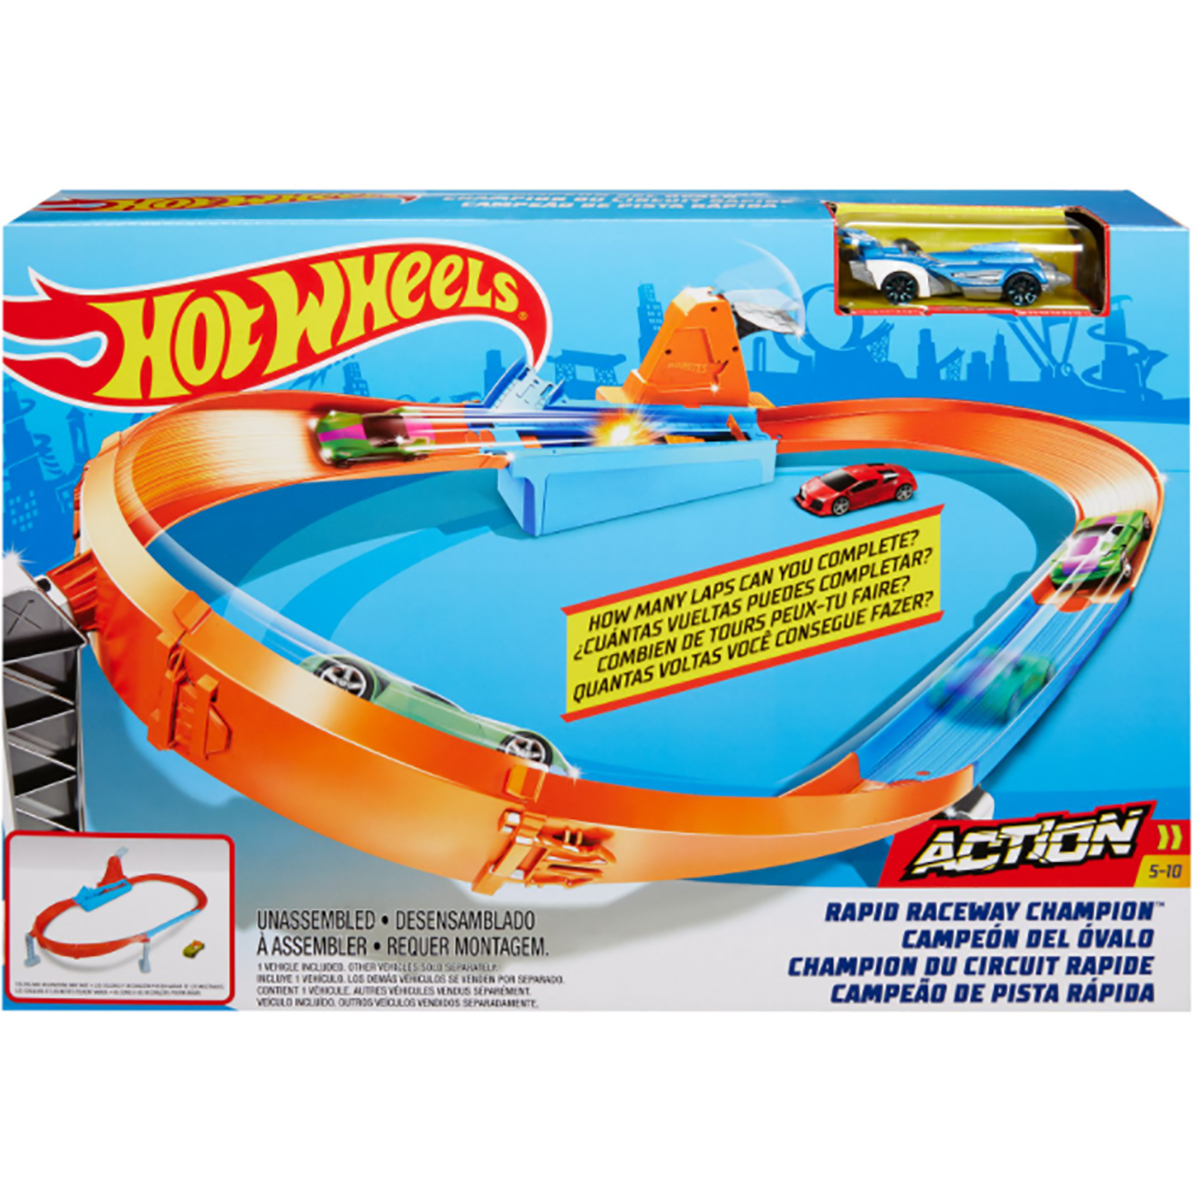 Set de joaca Circuit cu obstacole Hot Wheels, Rapid Raceway Champion GJM75